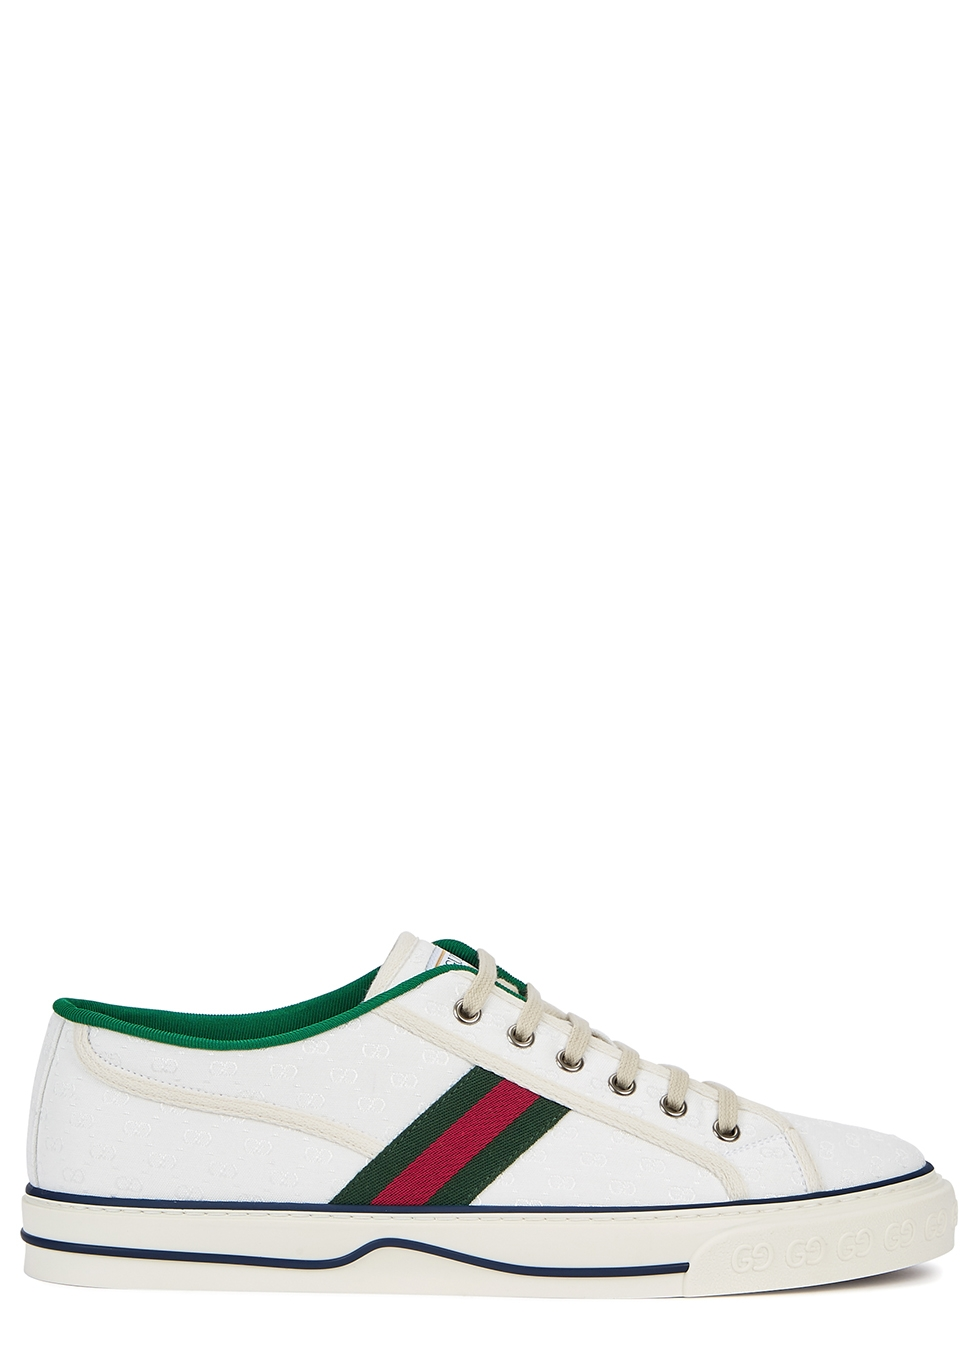 GG Mignon 25 monogrammed canvas sneakers